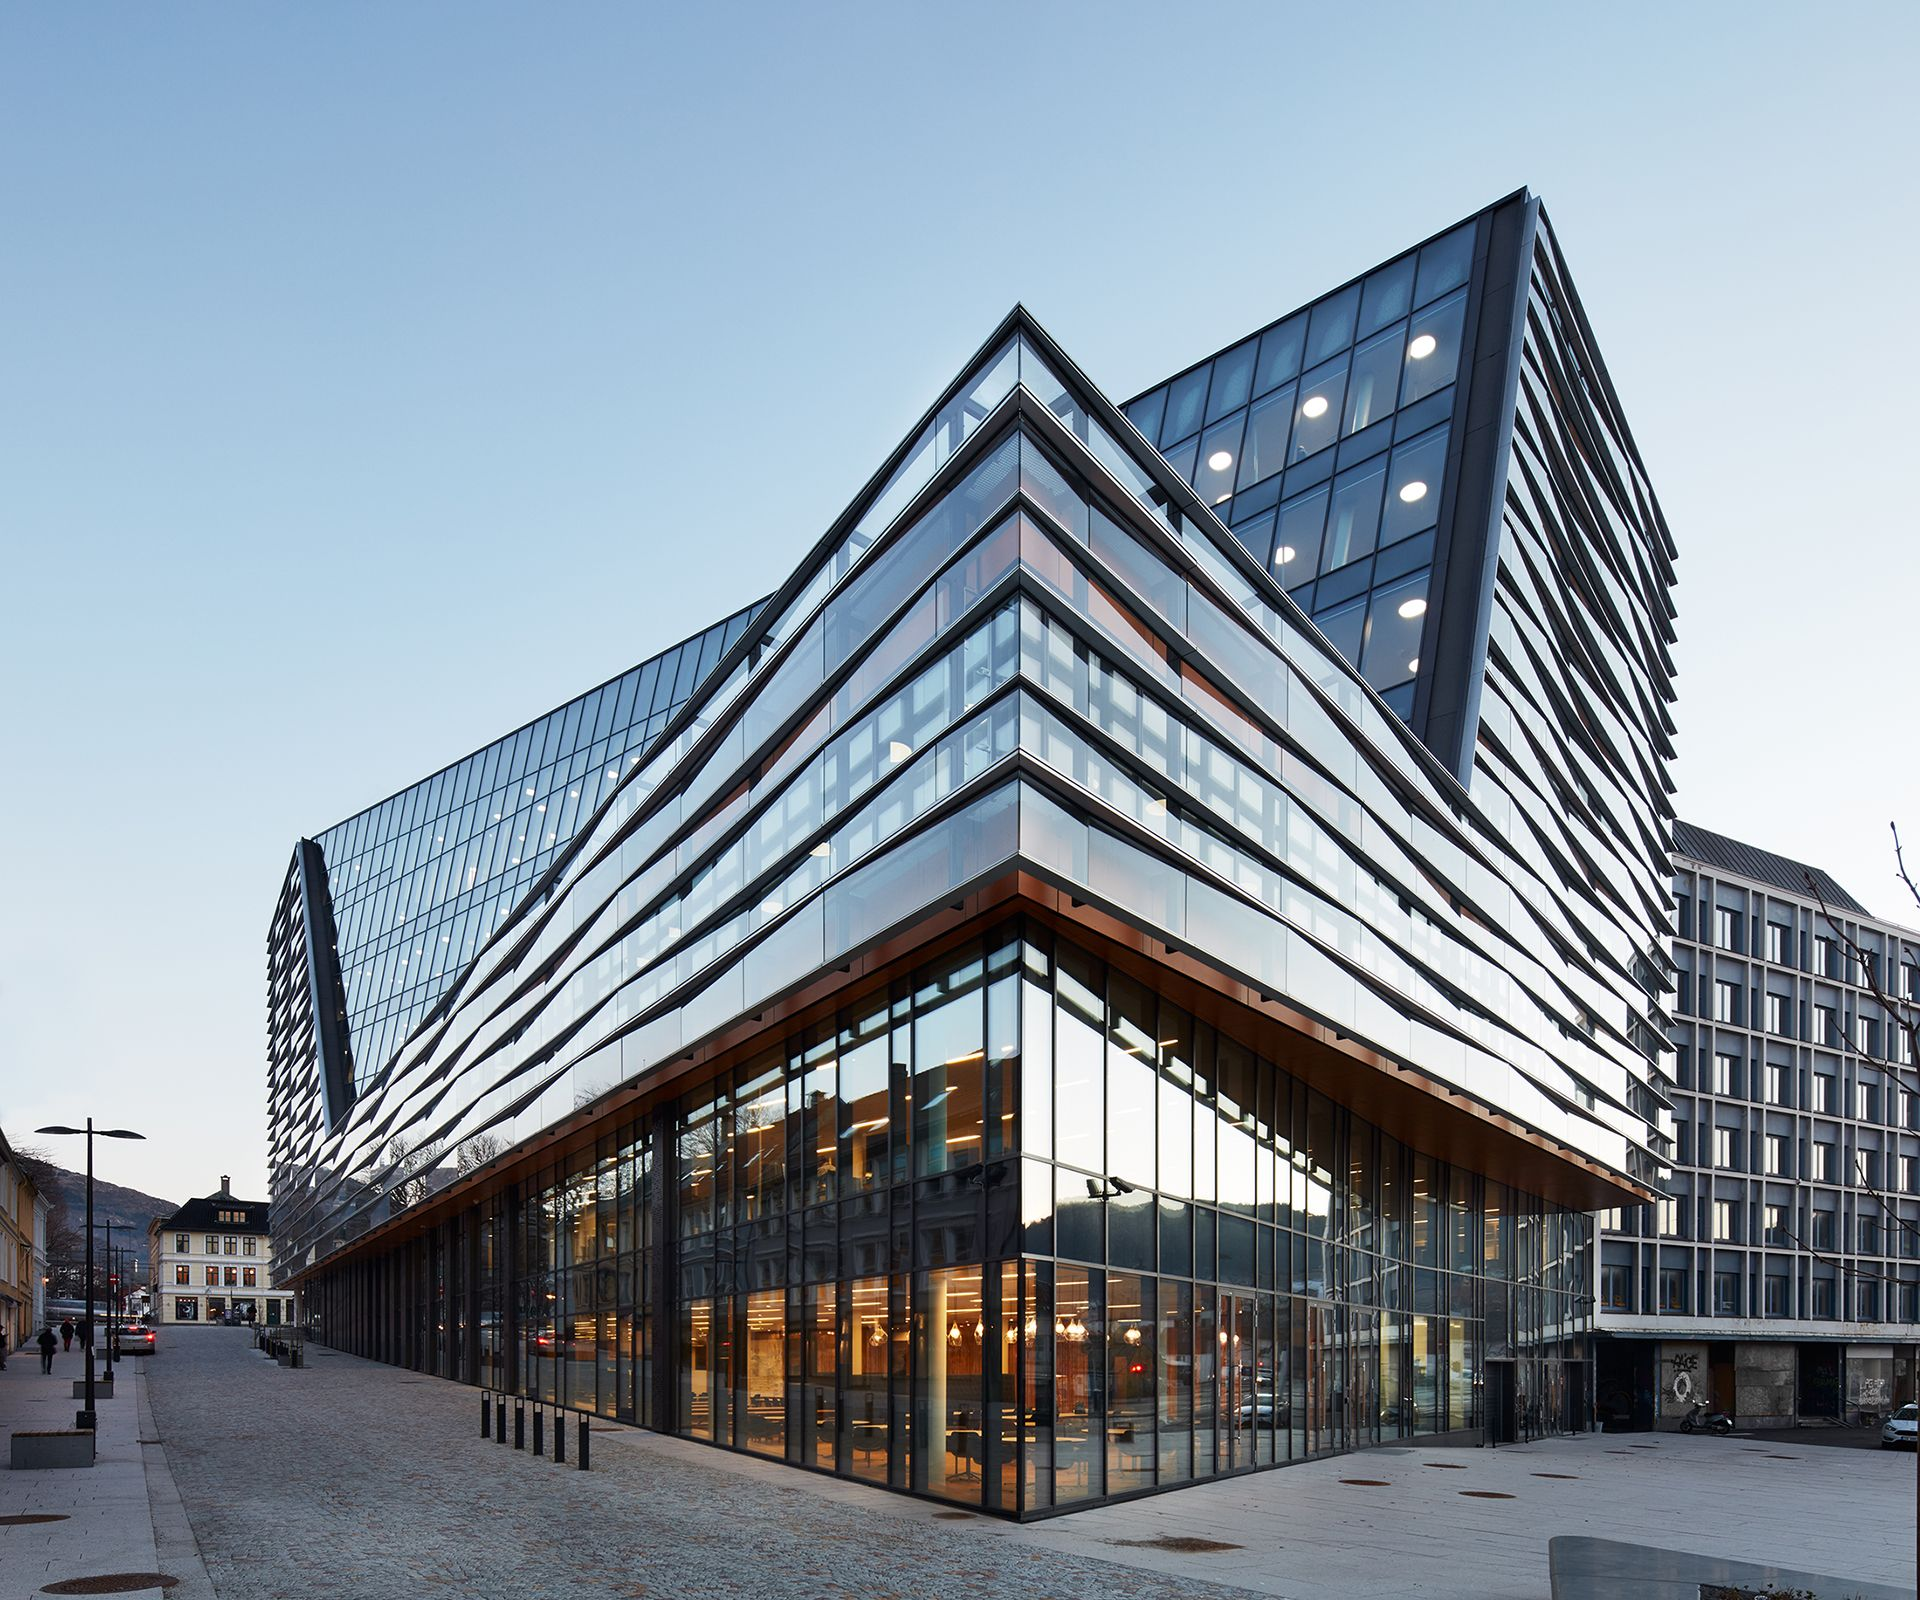 Jonsvollkvartalet Bergen Norway Office Building Architecture